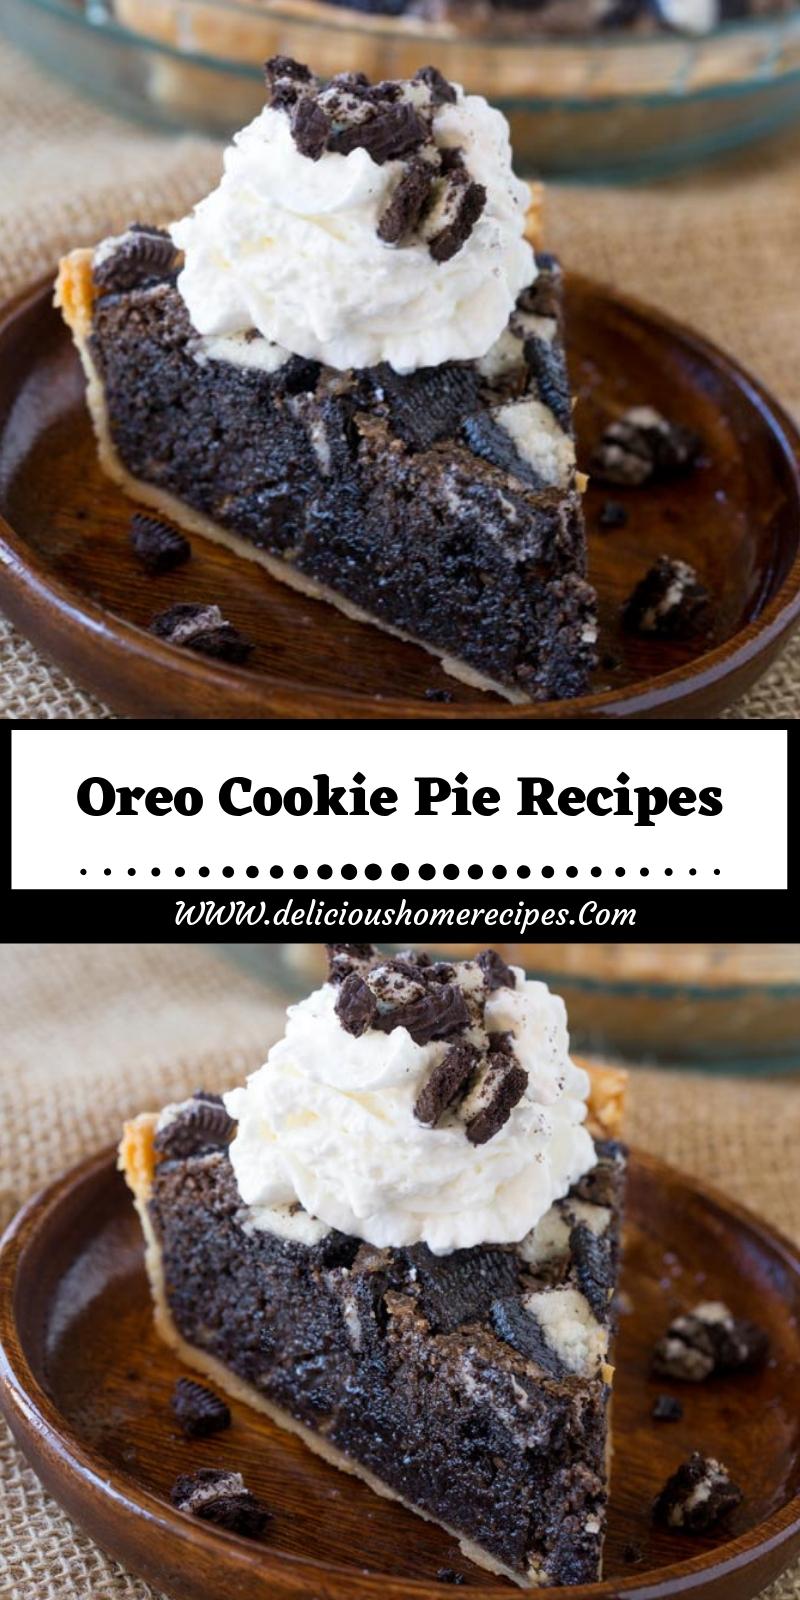 Oreo Cookie Pie Recipes